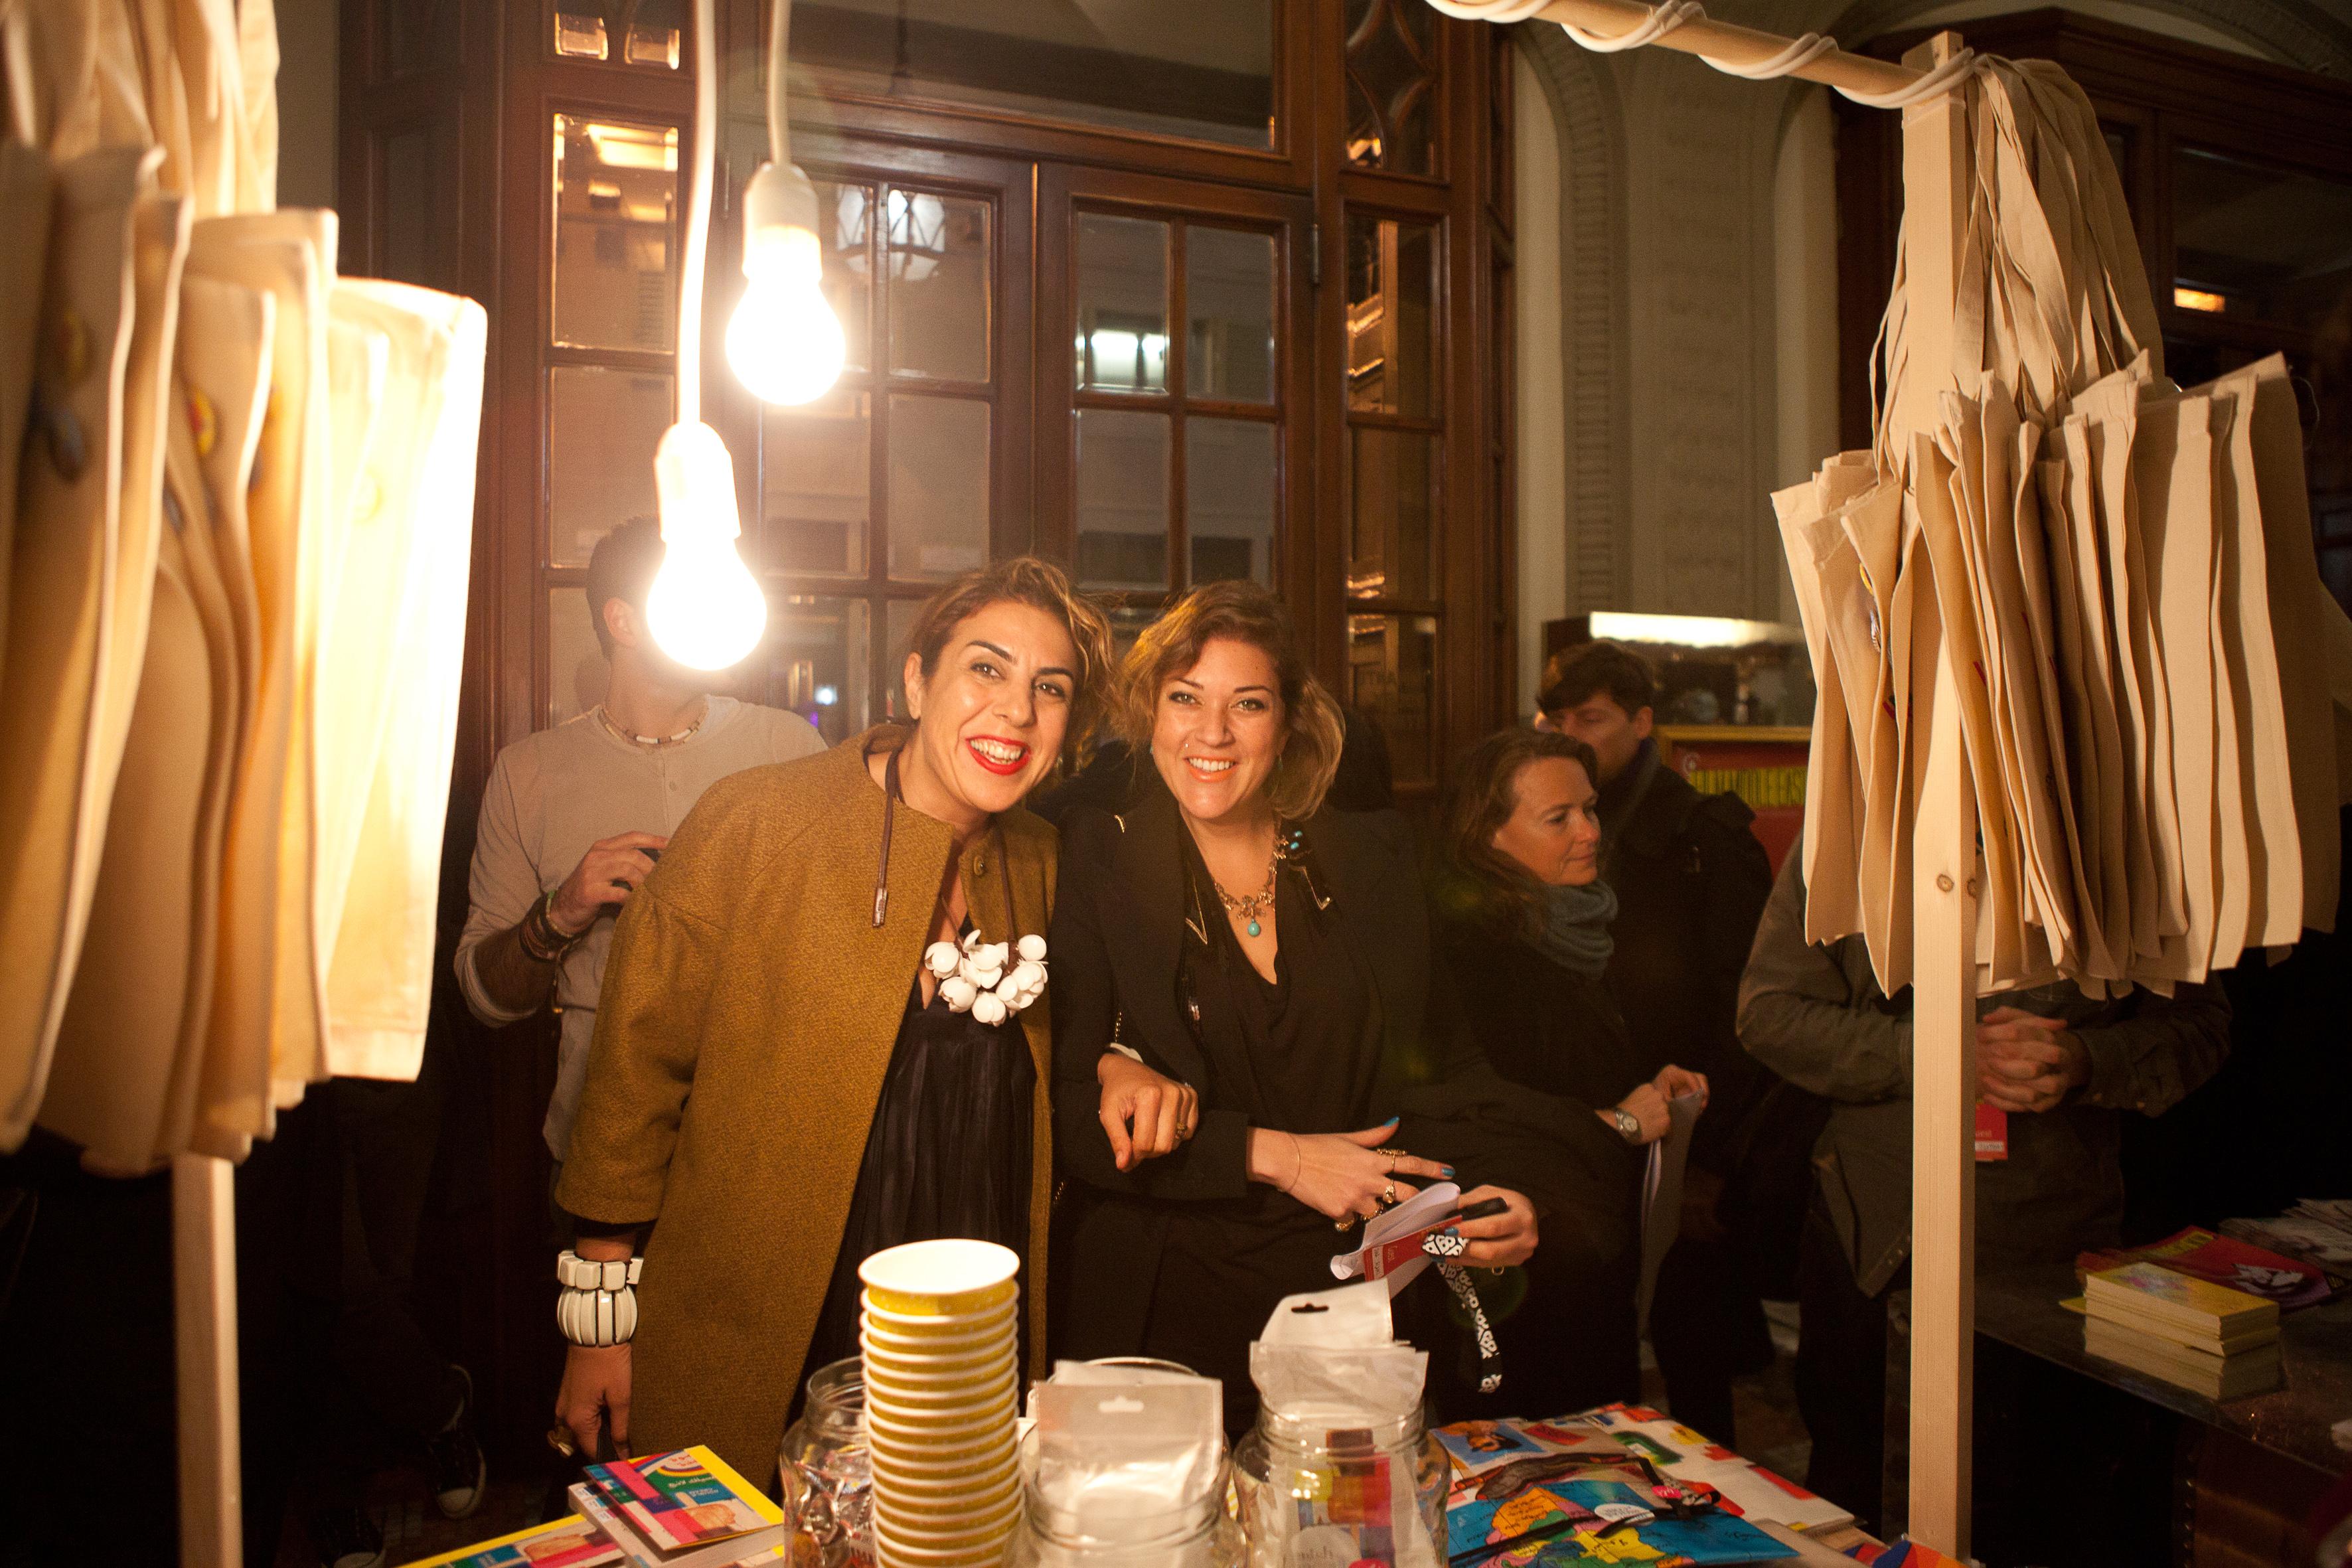 Lebanese designer Rana Salam and her assistant Dima Alami